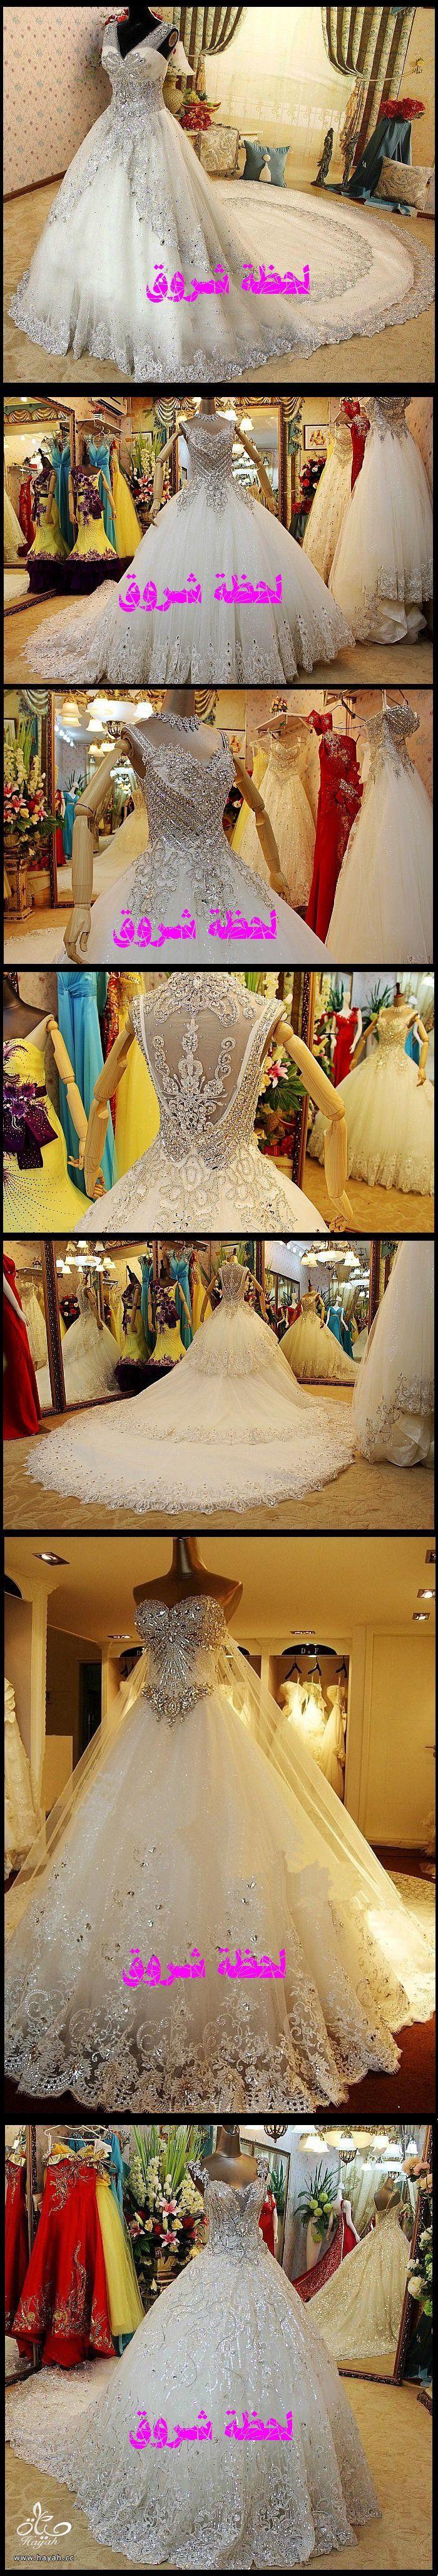 فساتين زفاف hayahcc_1474729761_482.jpg